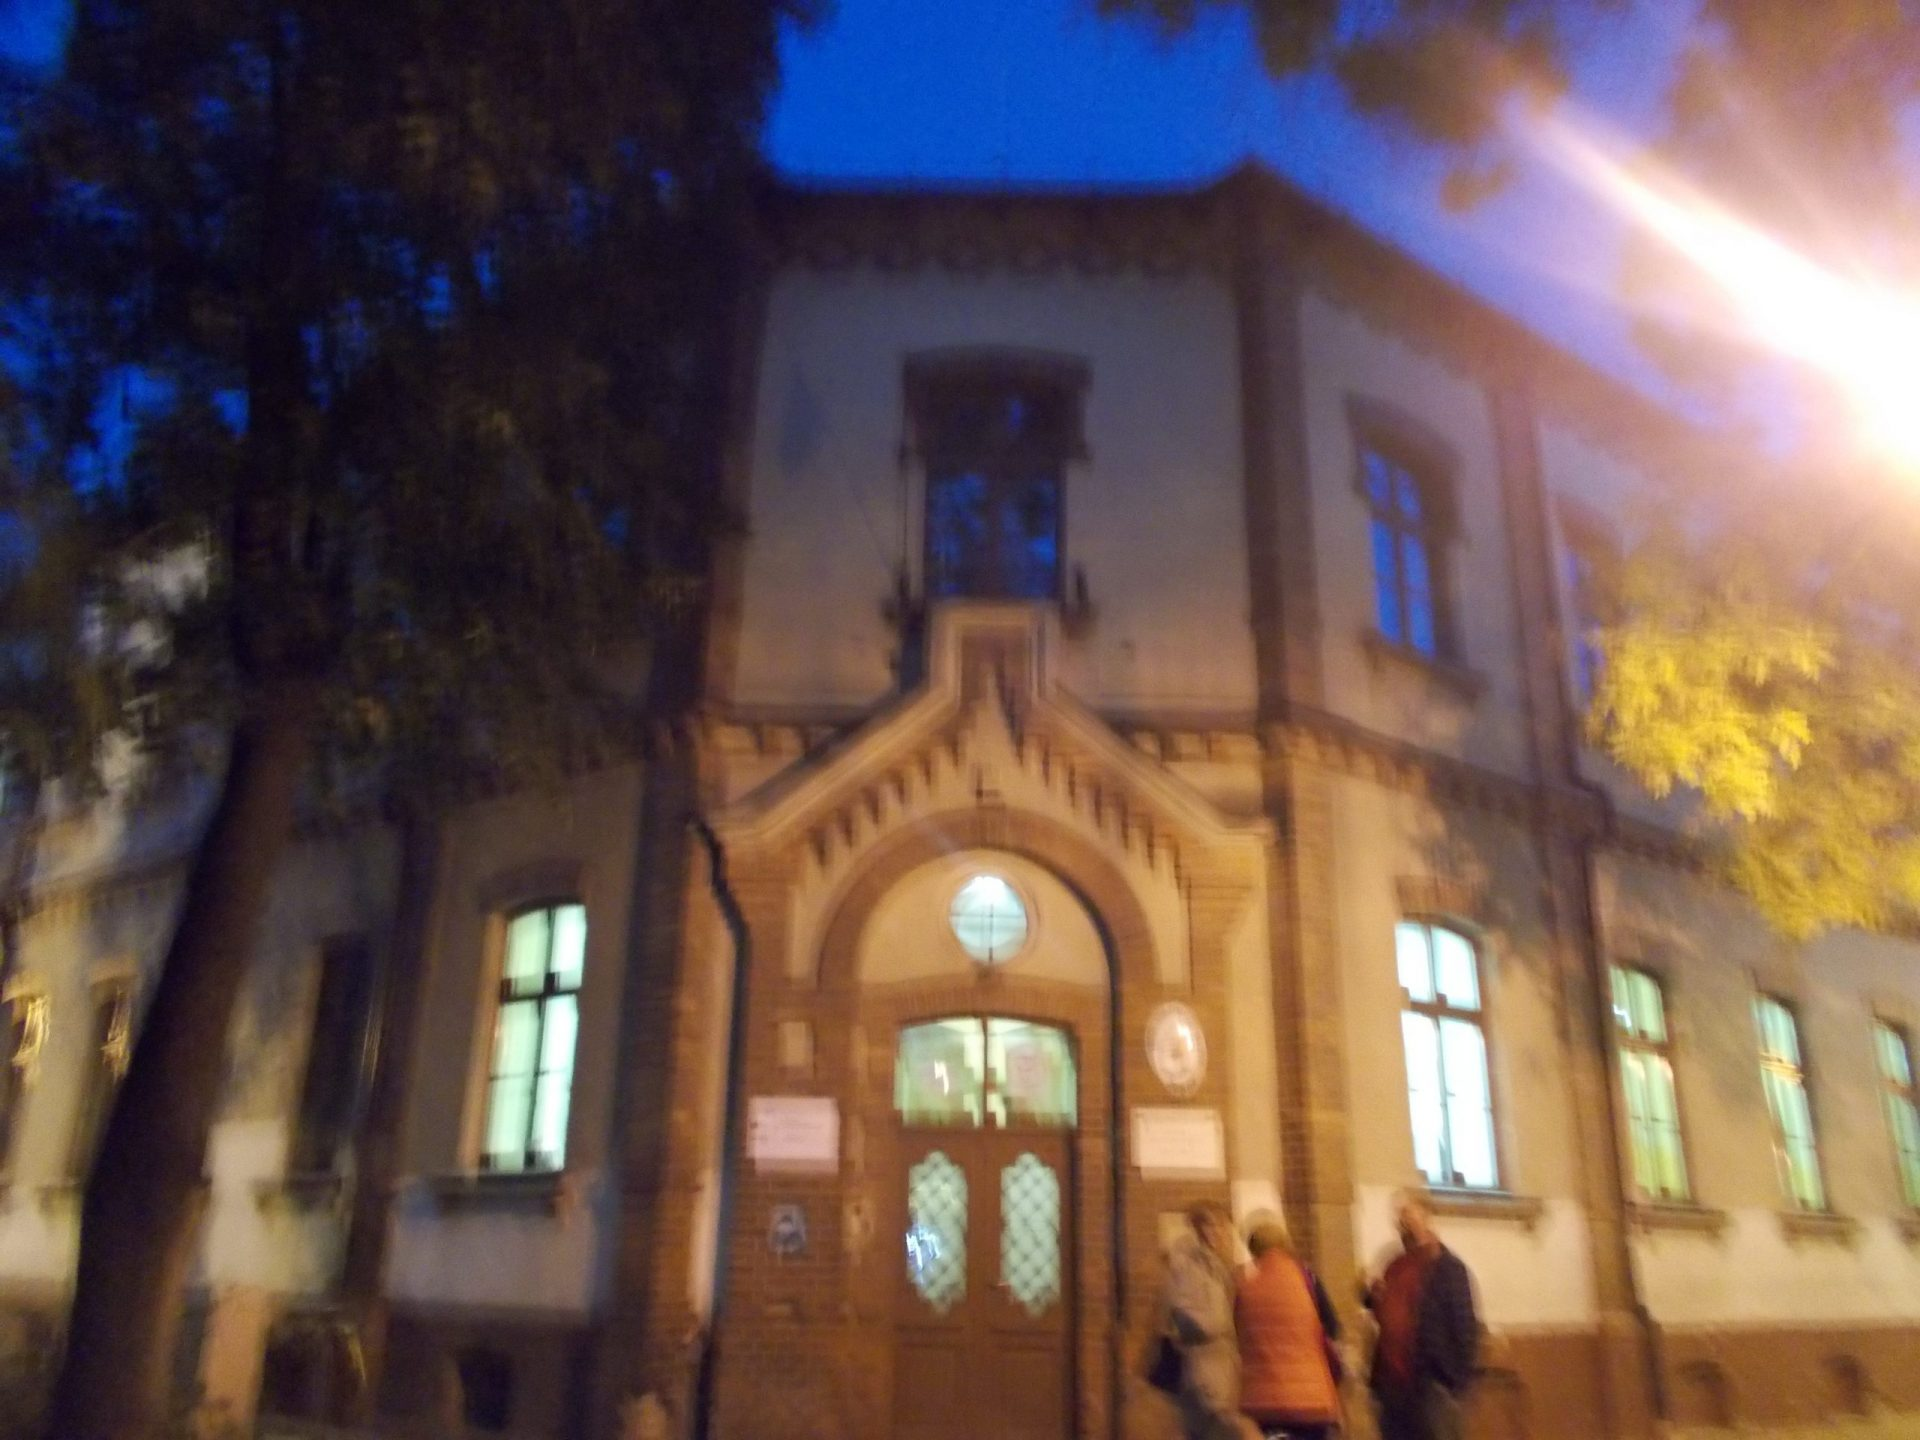 Monori Kossuth Lajos Általános Iskola